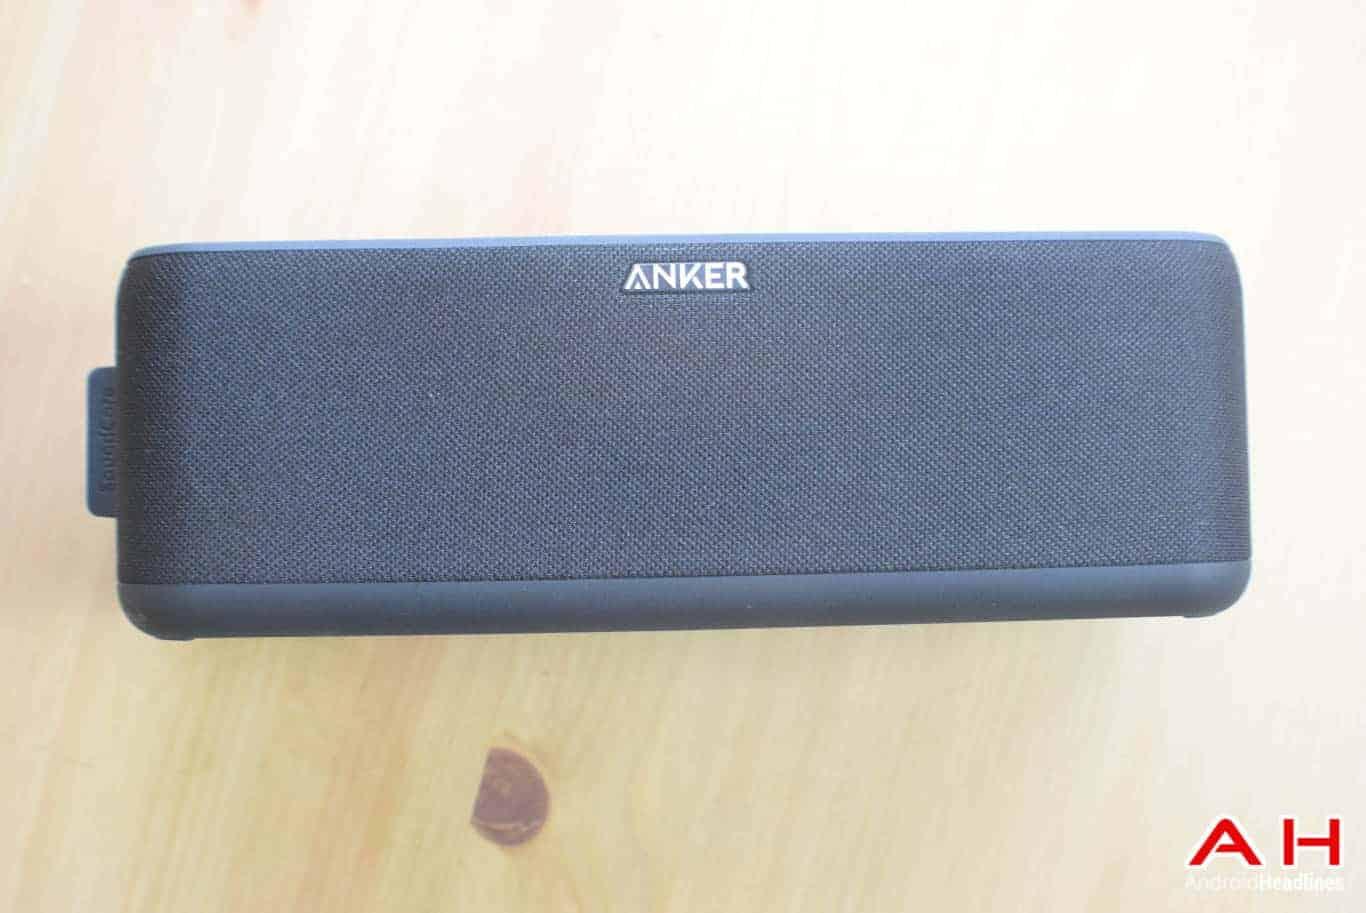 Anker SoundCore Boost AM AH 7